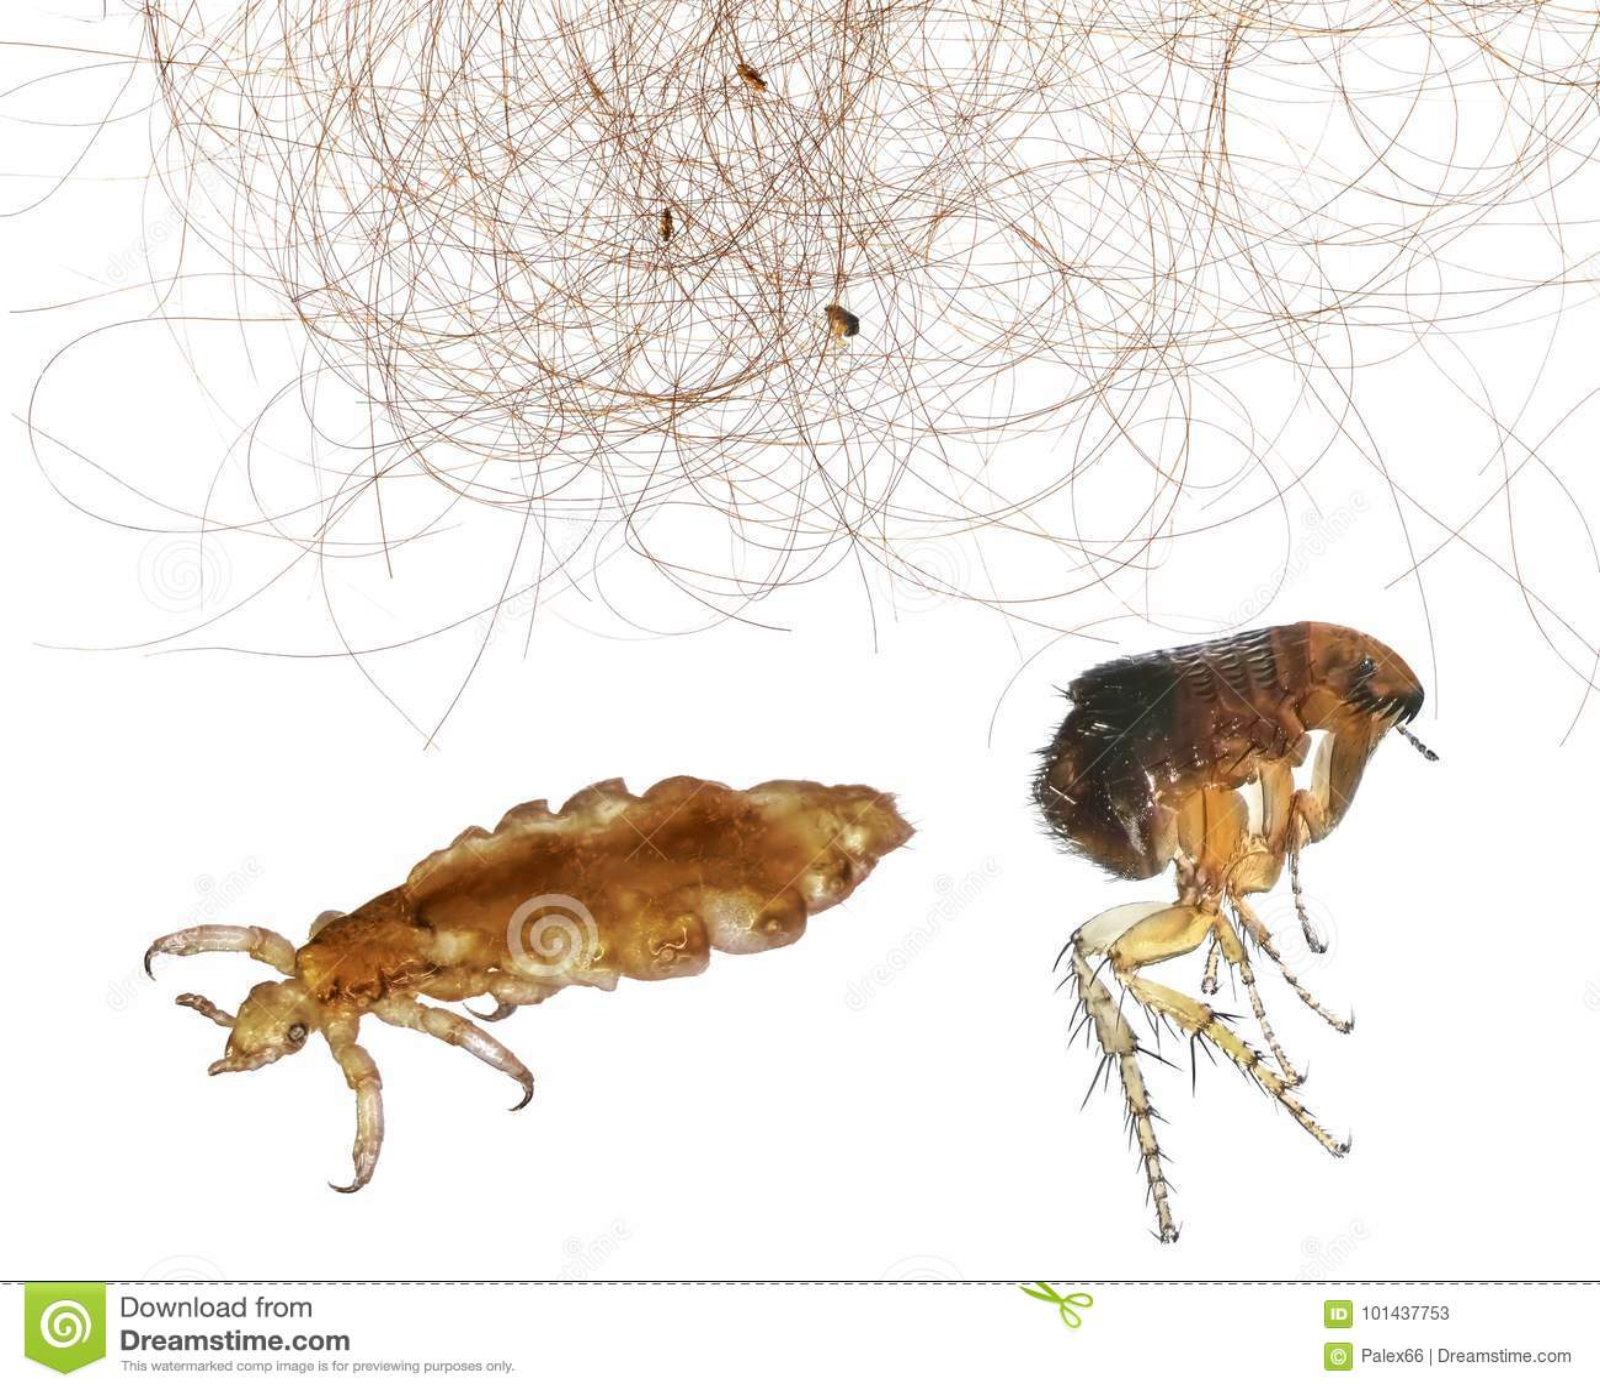 Flea Bites vs Lice - How Do You Tell Them Apart? |Flea Vs Lice